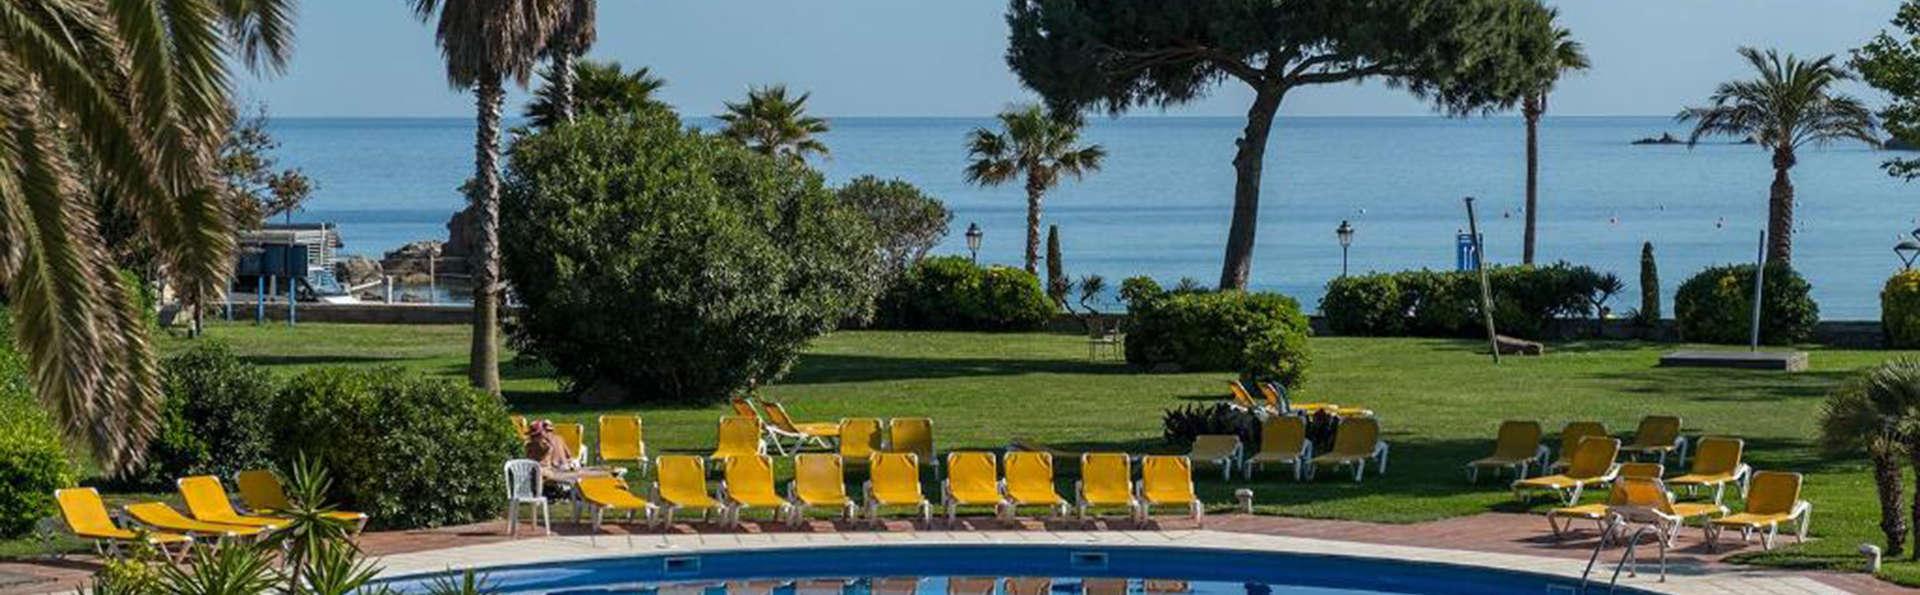 S'Agaró Hotel Wellness & Spa - EDIT_VISTAS_A_LA_PISCINA_1.jpg